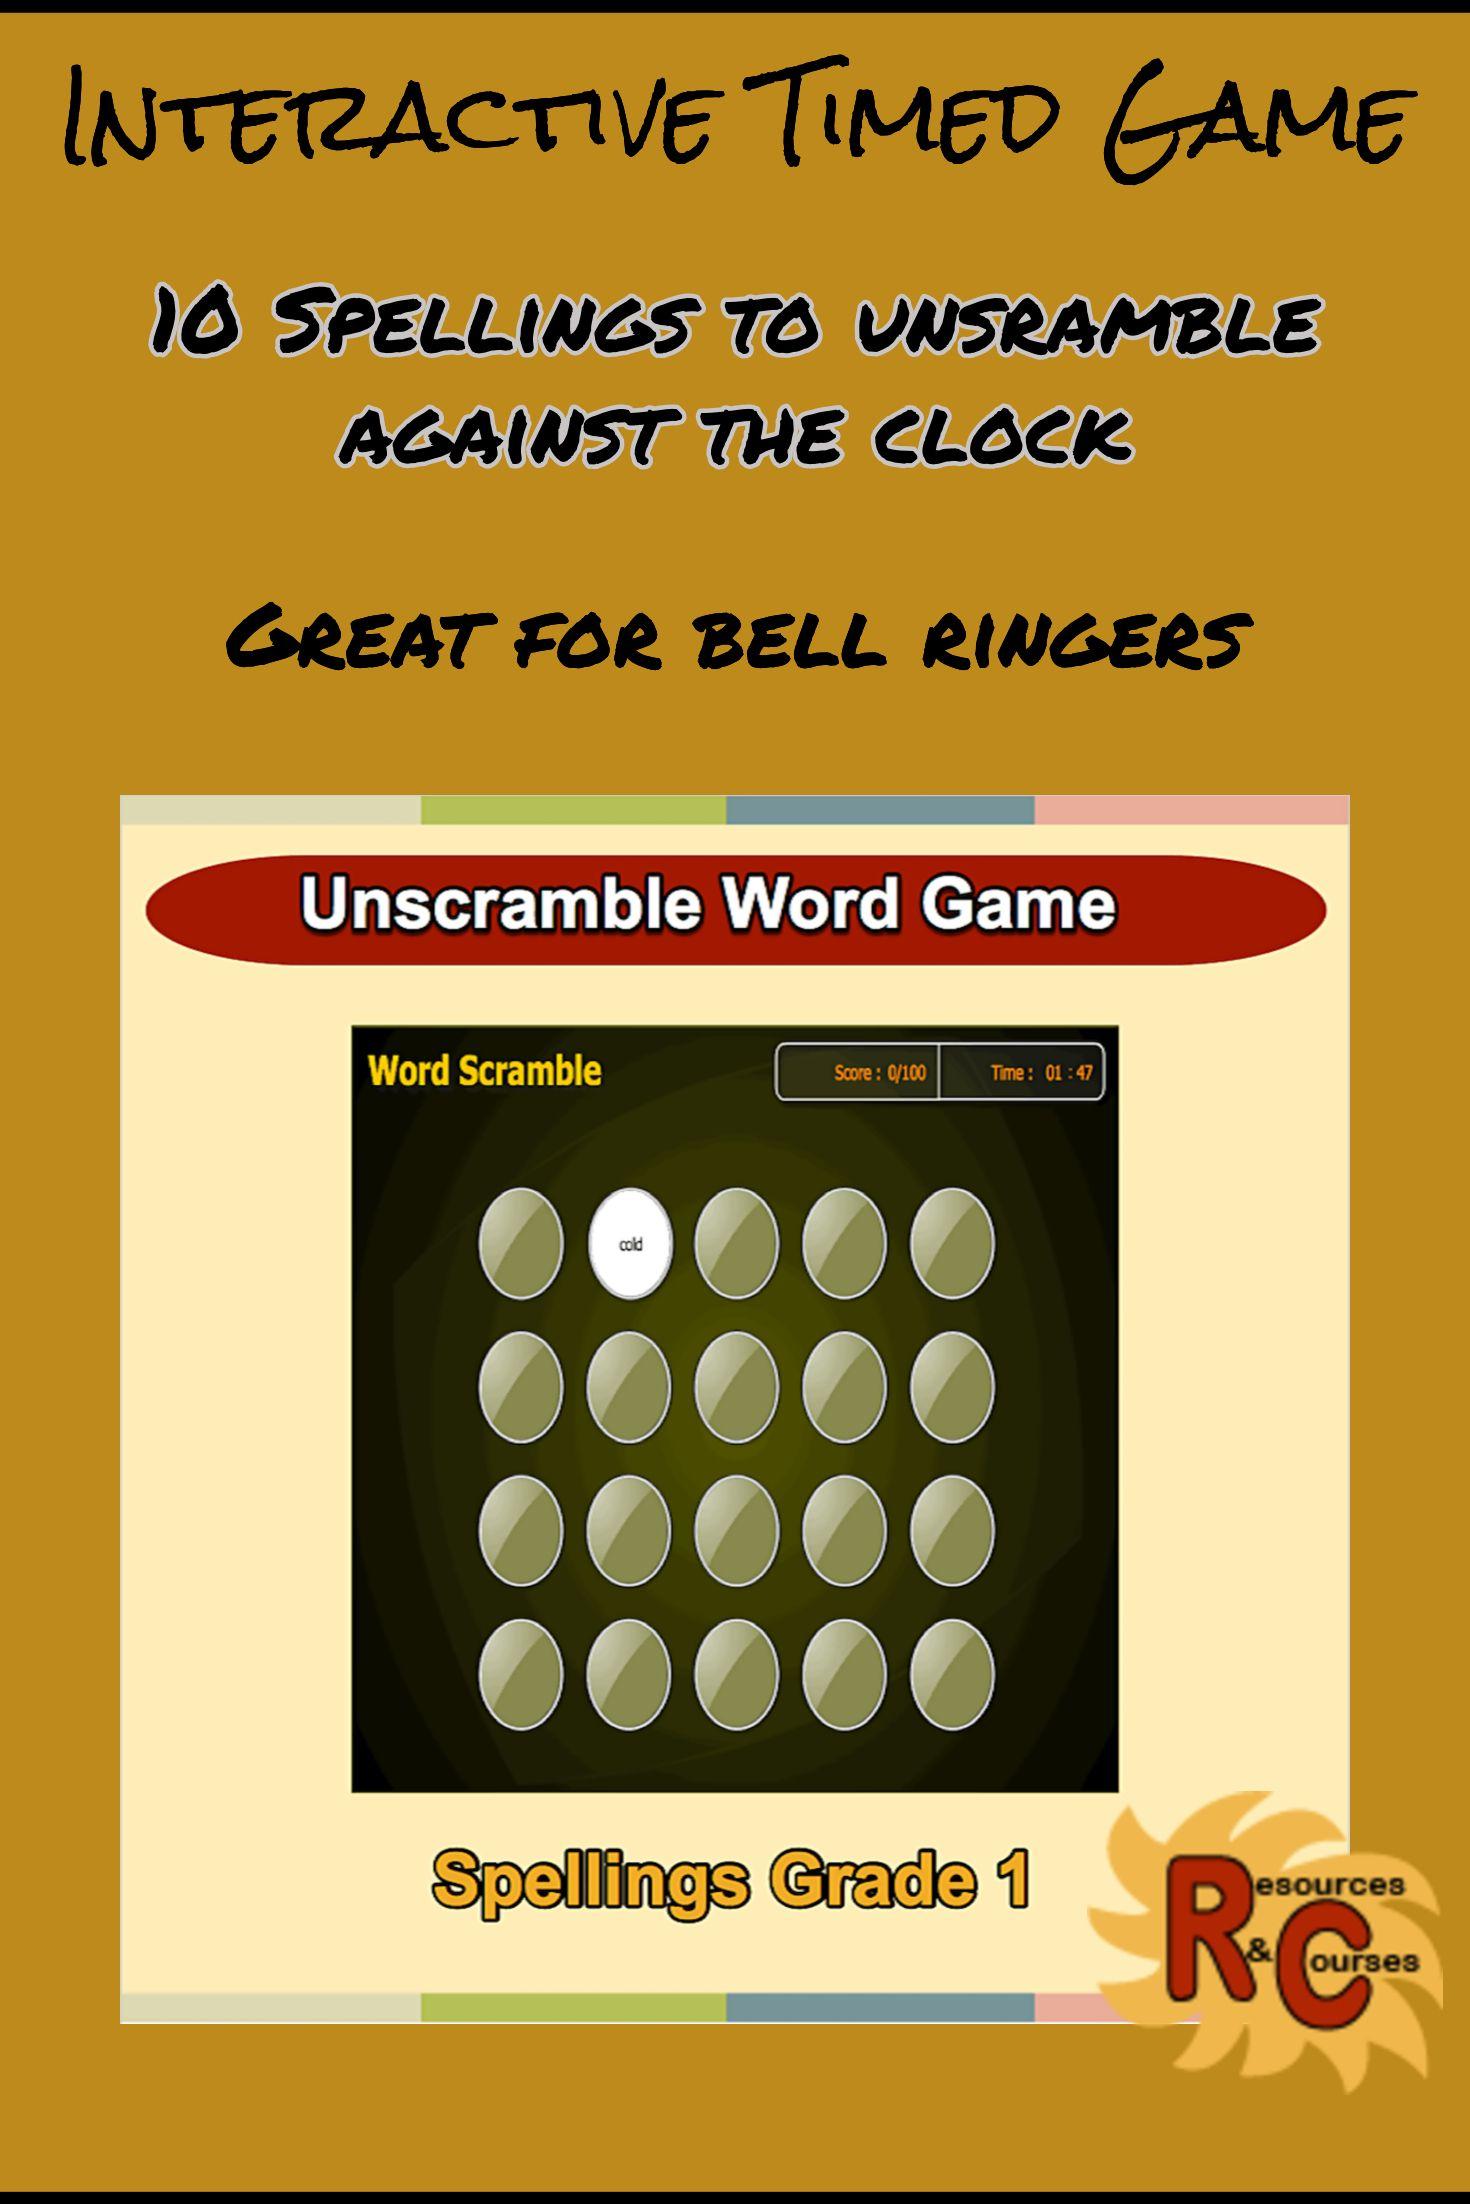 Grade 1 Spellings Word Scramble Game For Kids Unscramble